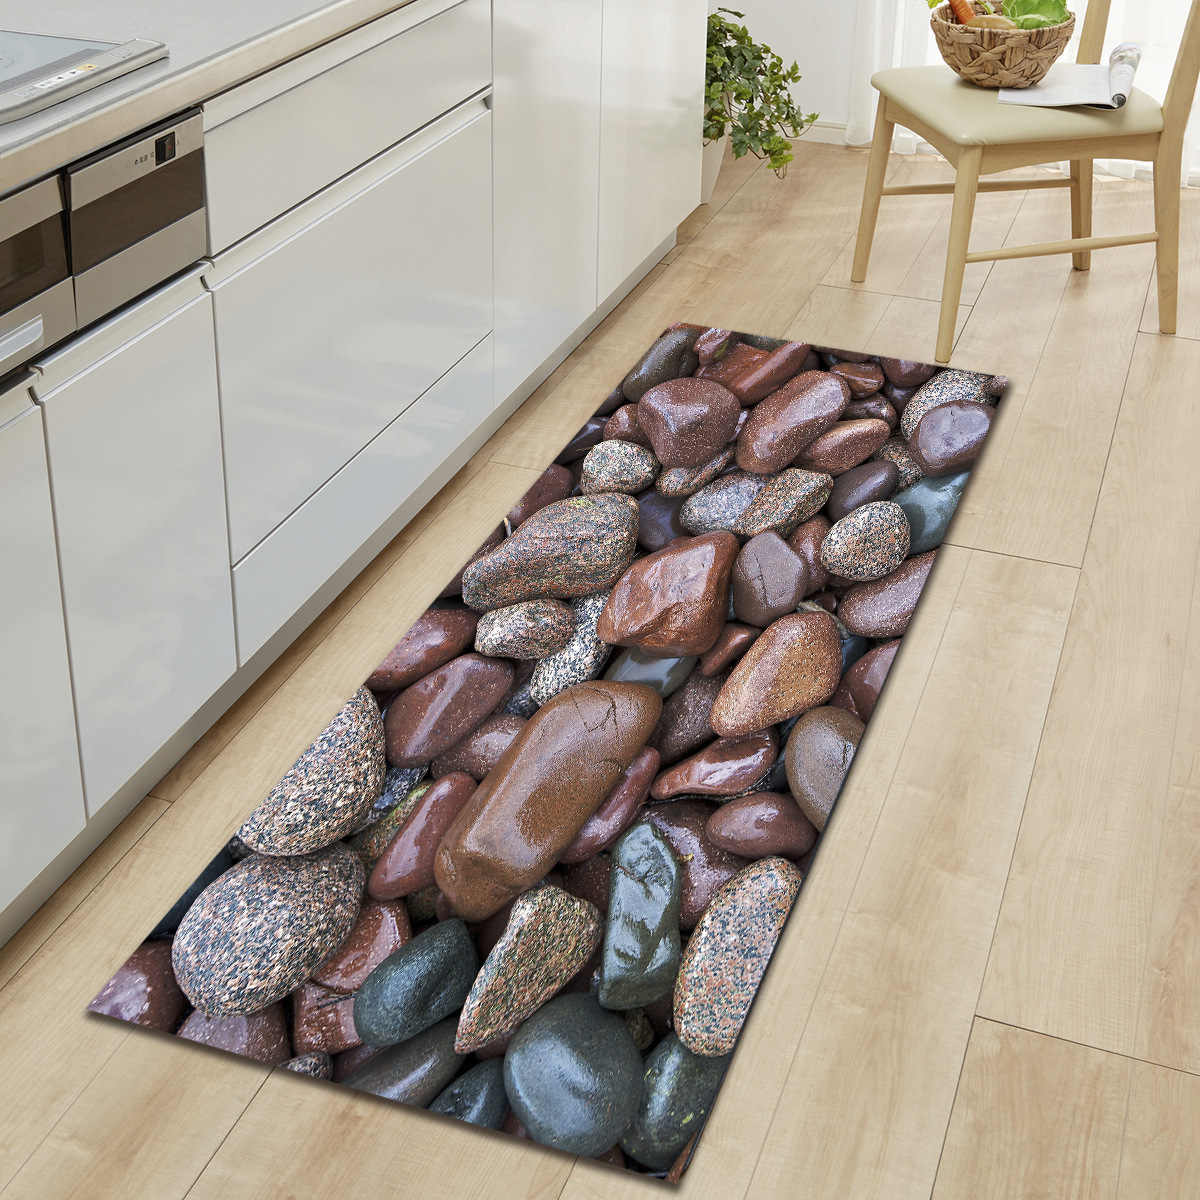 Zeegle tapete de cozinha tapetes antiderrapantes tapetes de mesa absorvente tapetes de cozinha macio 3d impresso